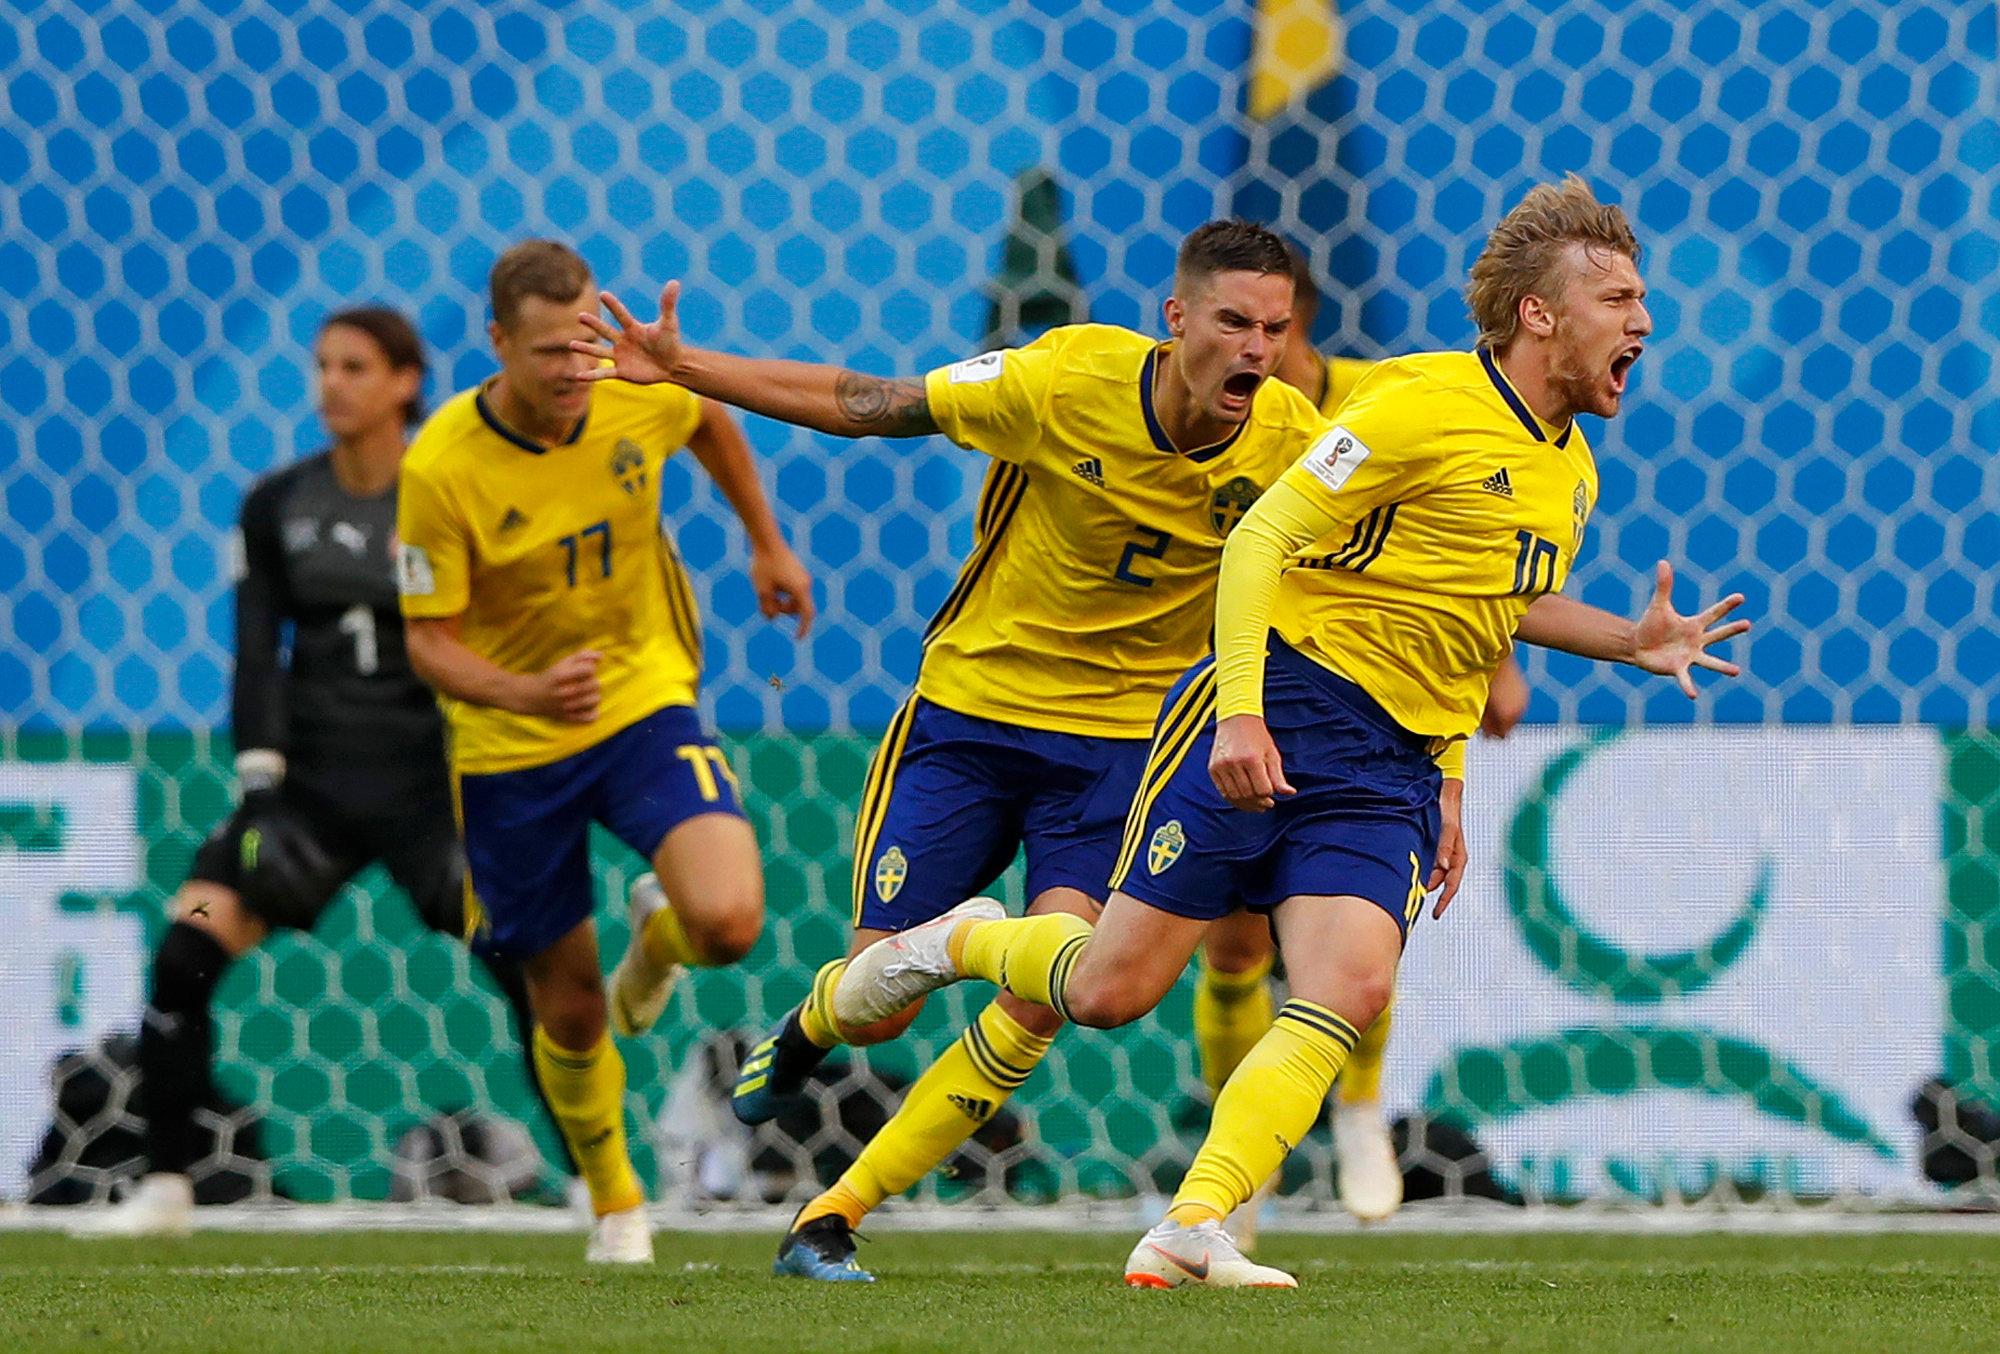 Emil Forsberg celebrates his 66th minute goal against Switzerland.